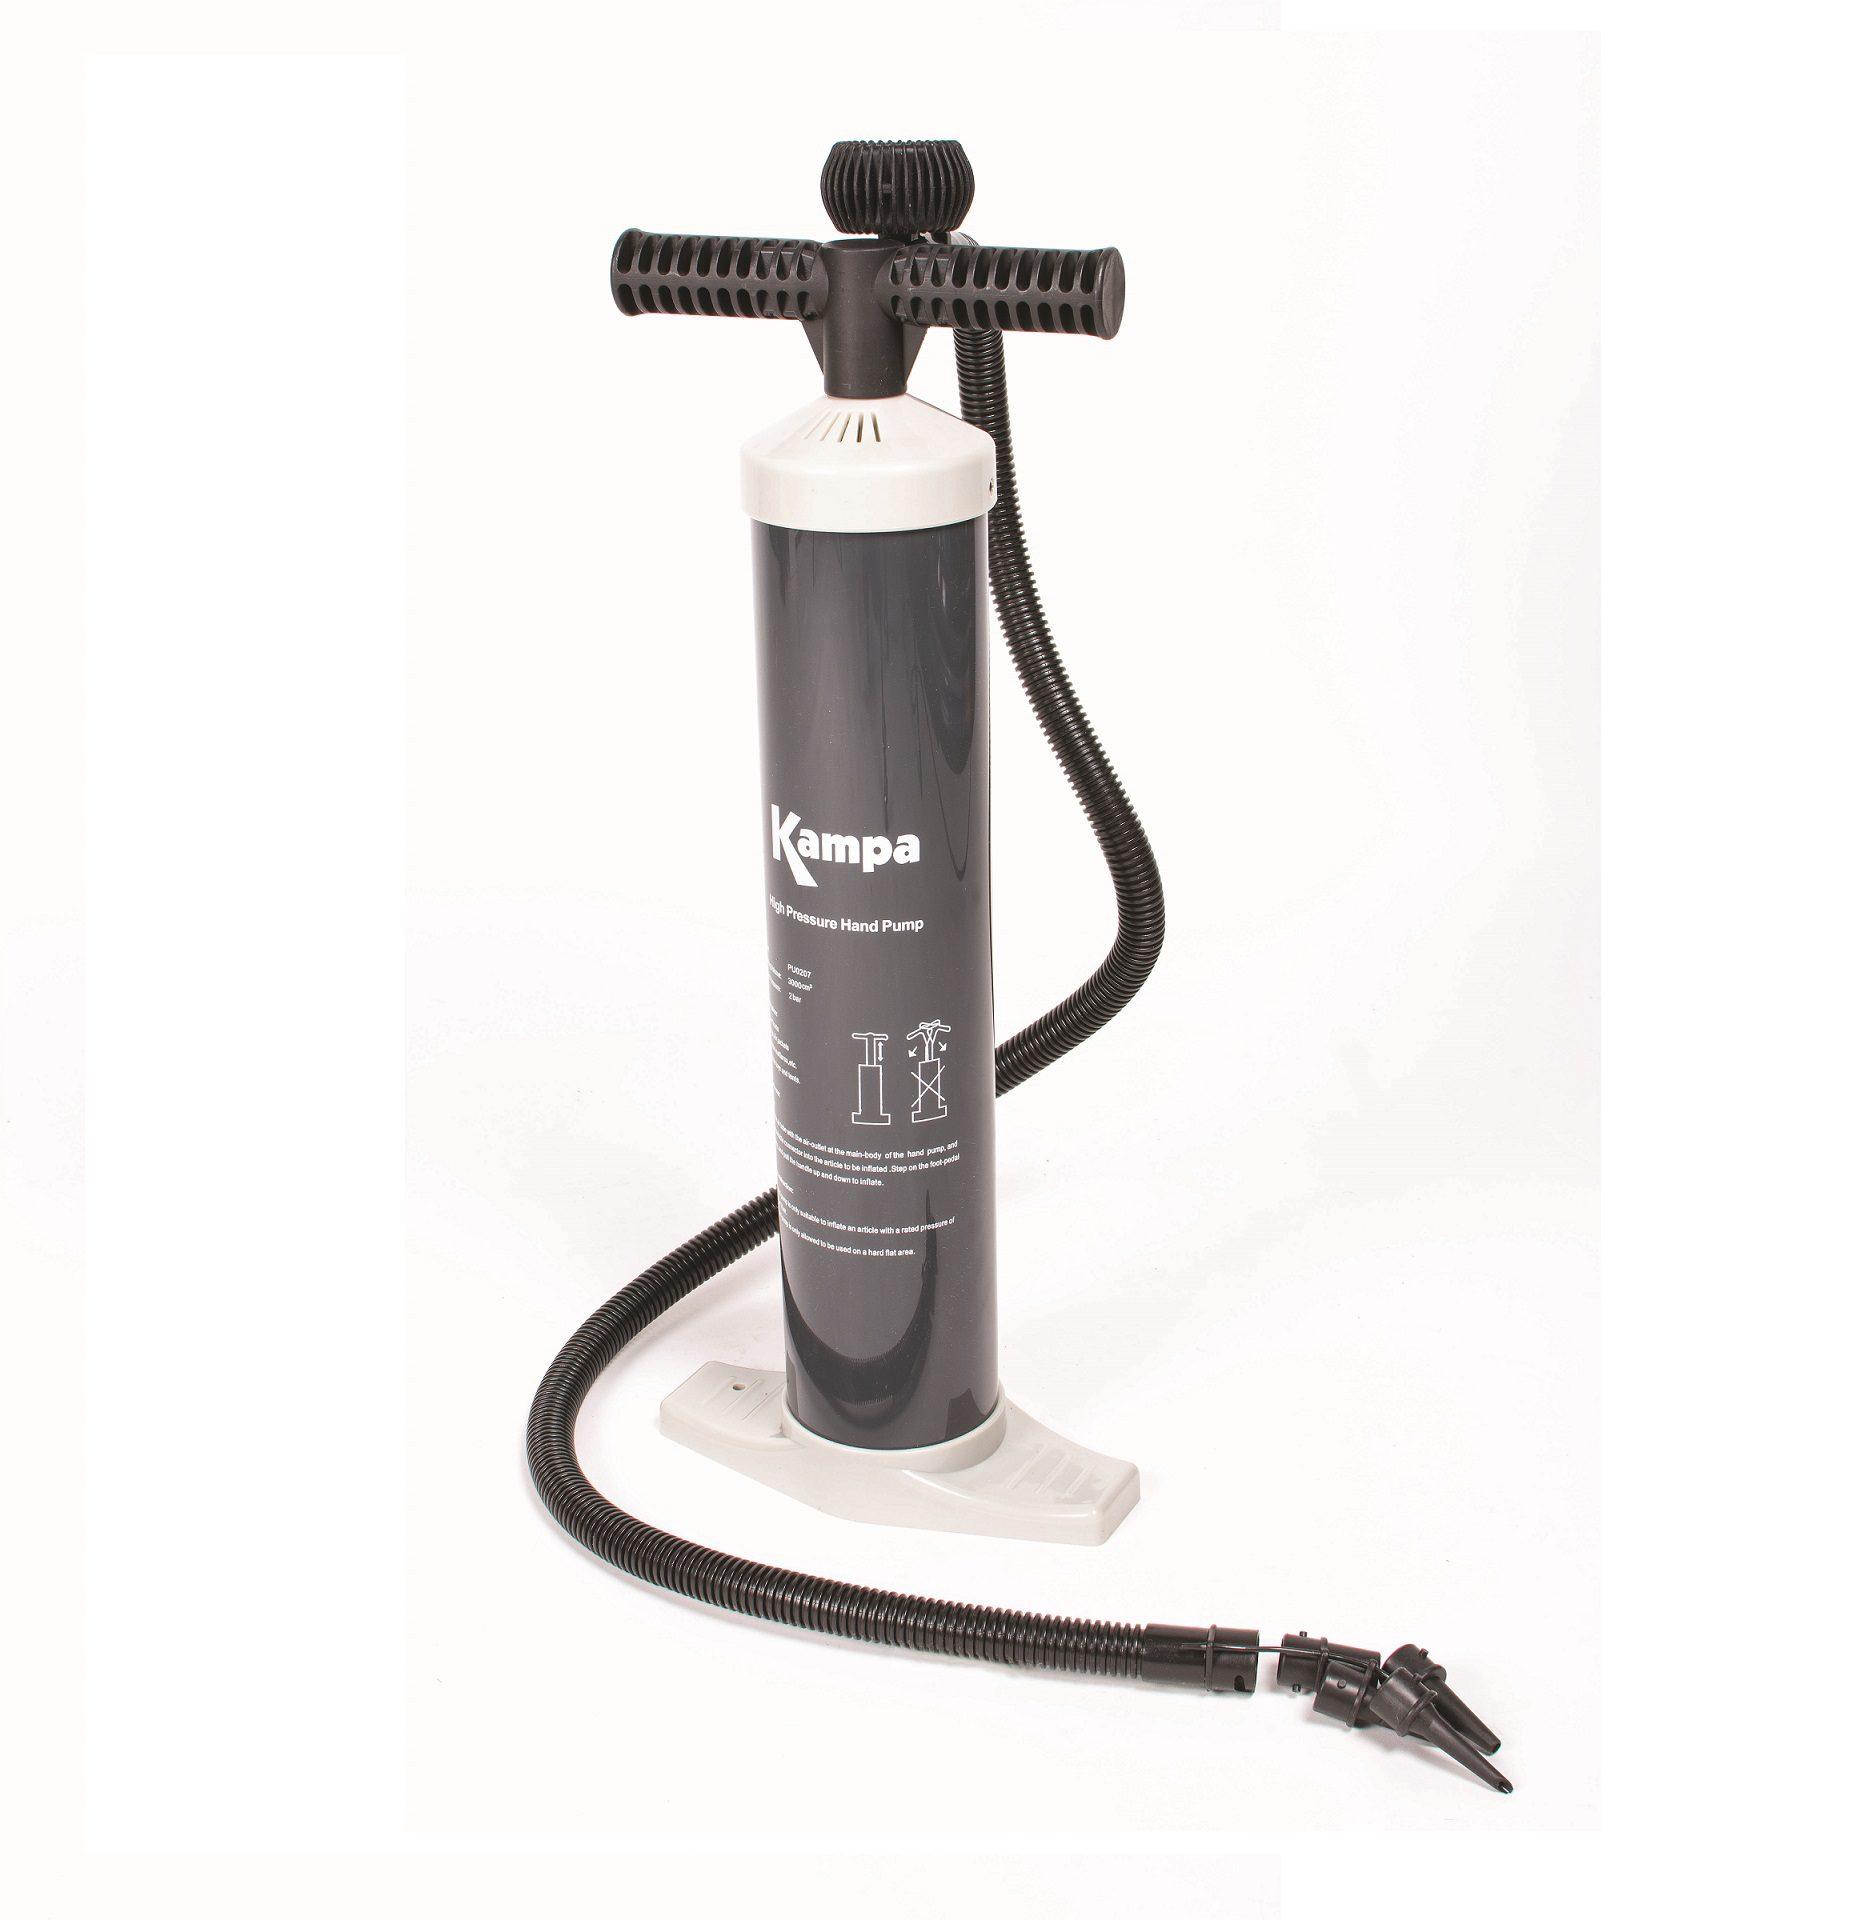 Kampa Downdraught High Performance Hand Pump - PU0207